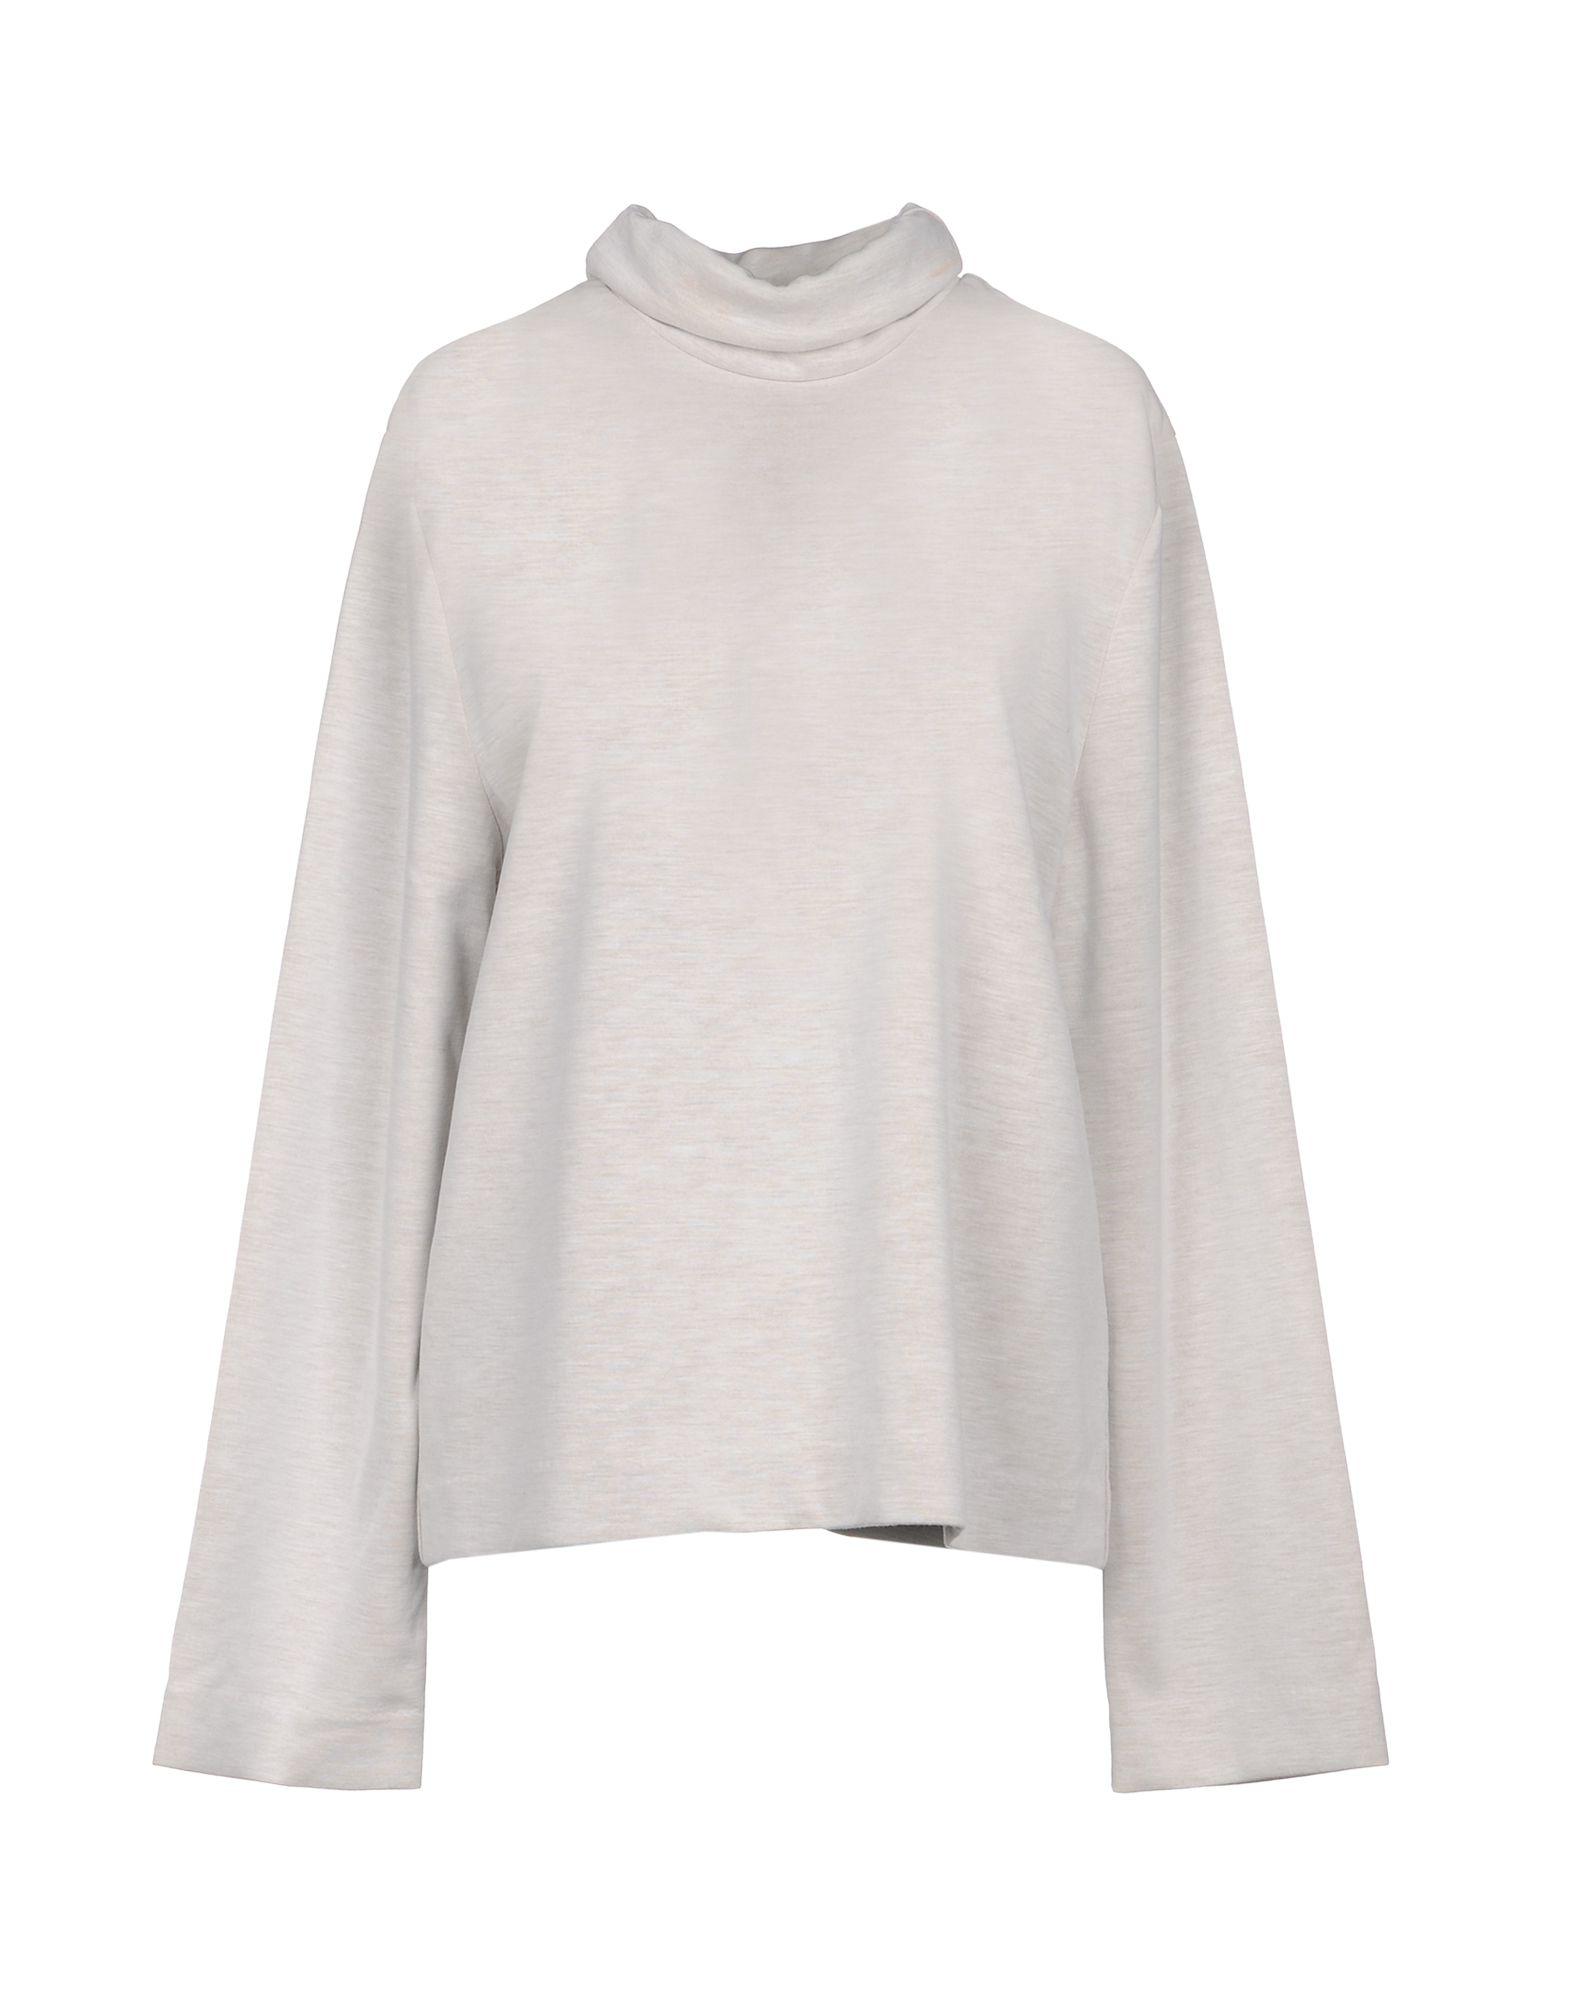 IRIS & INK T-Shirt in Light Grey